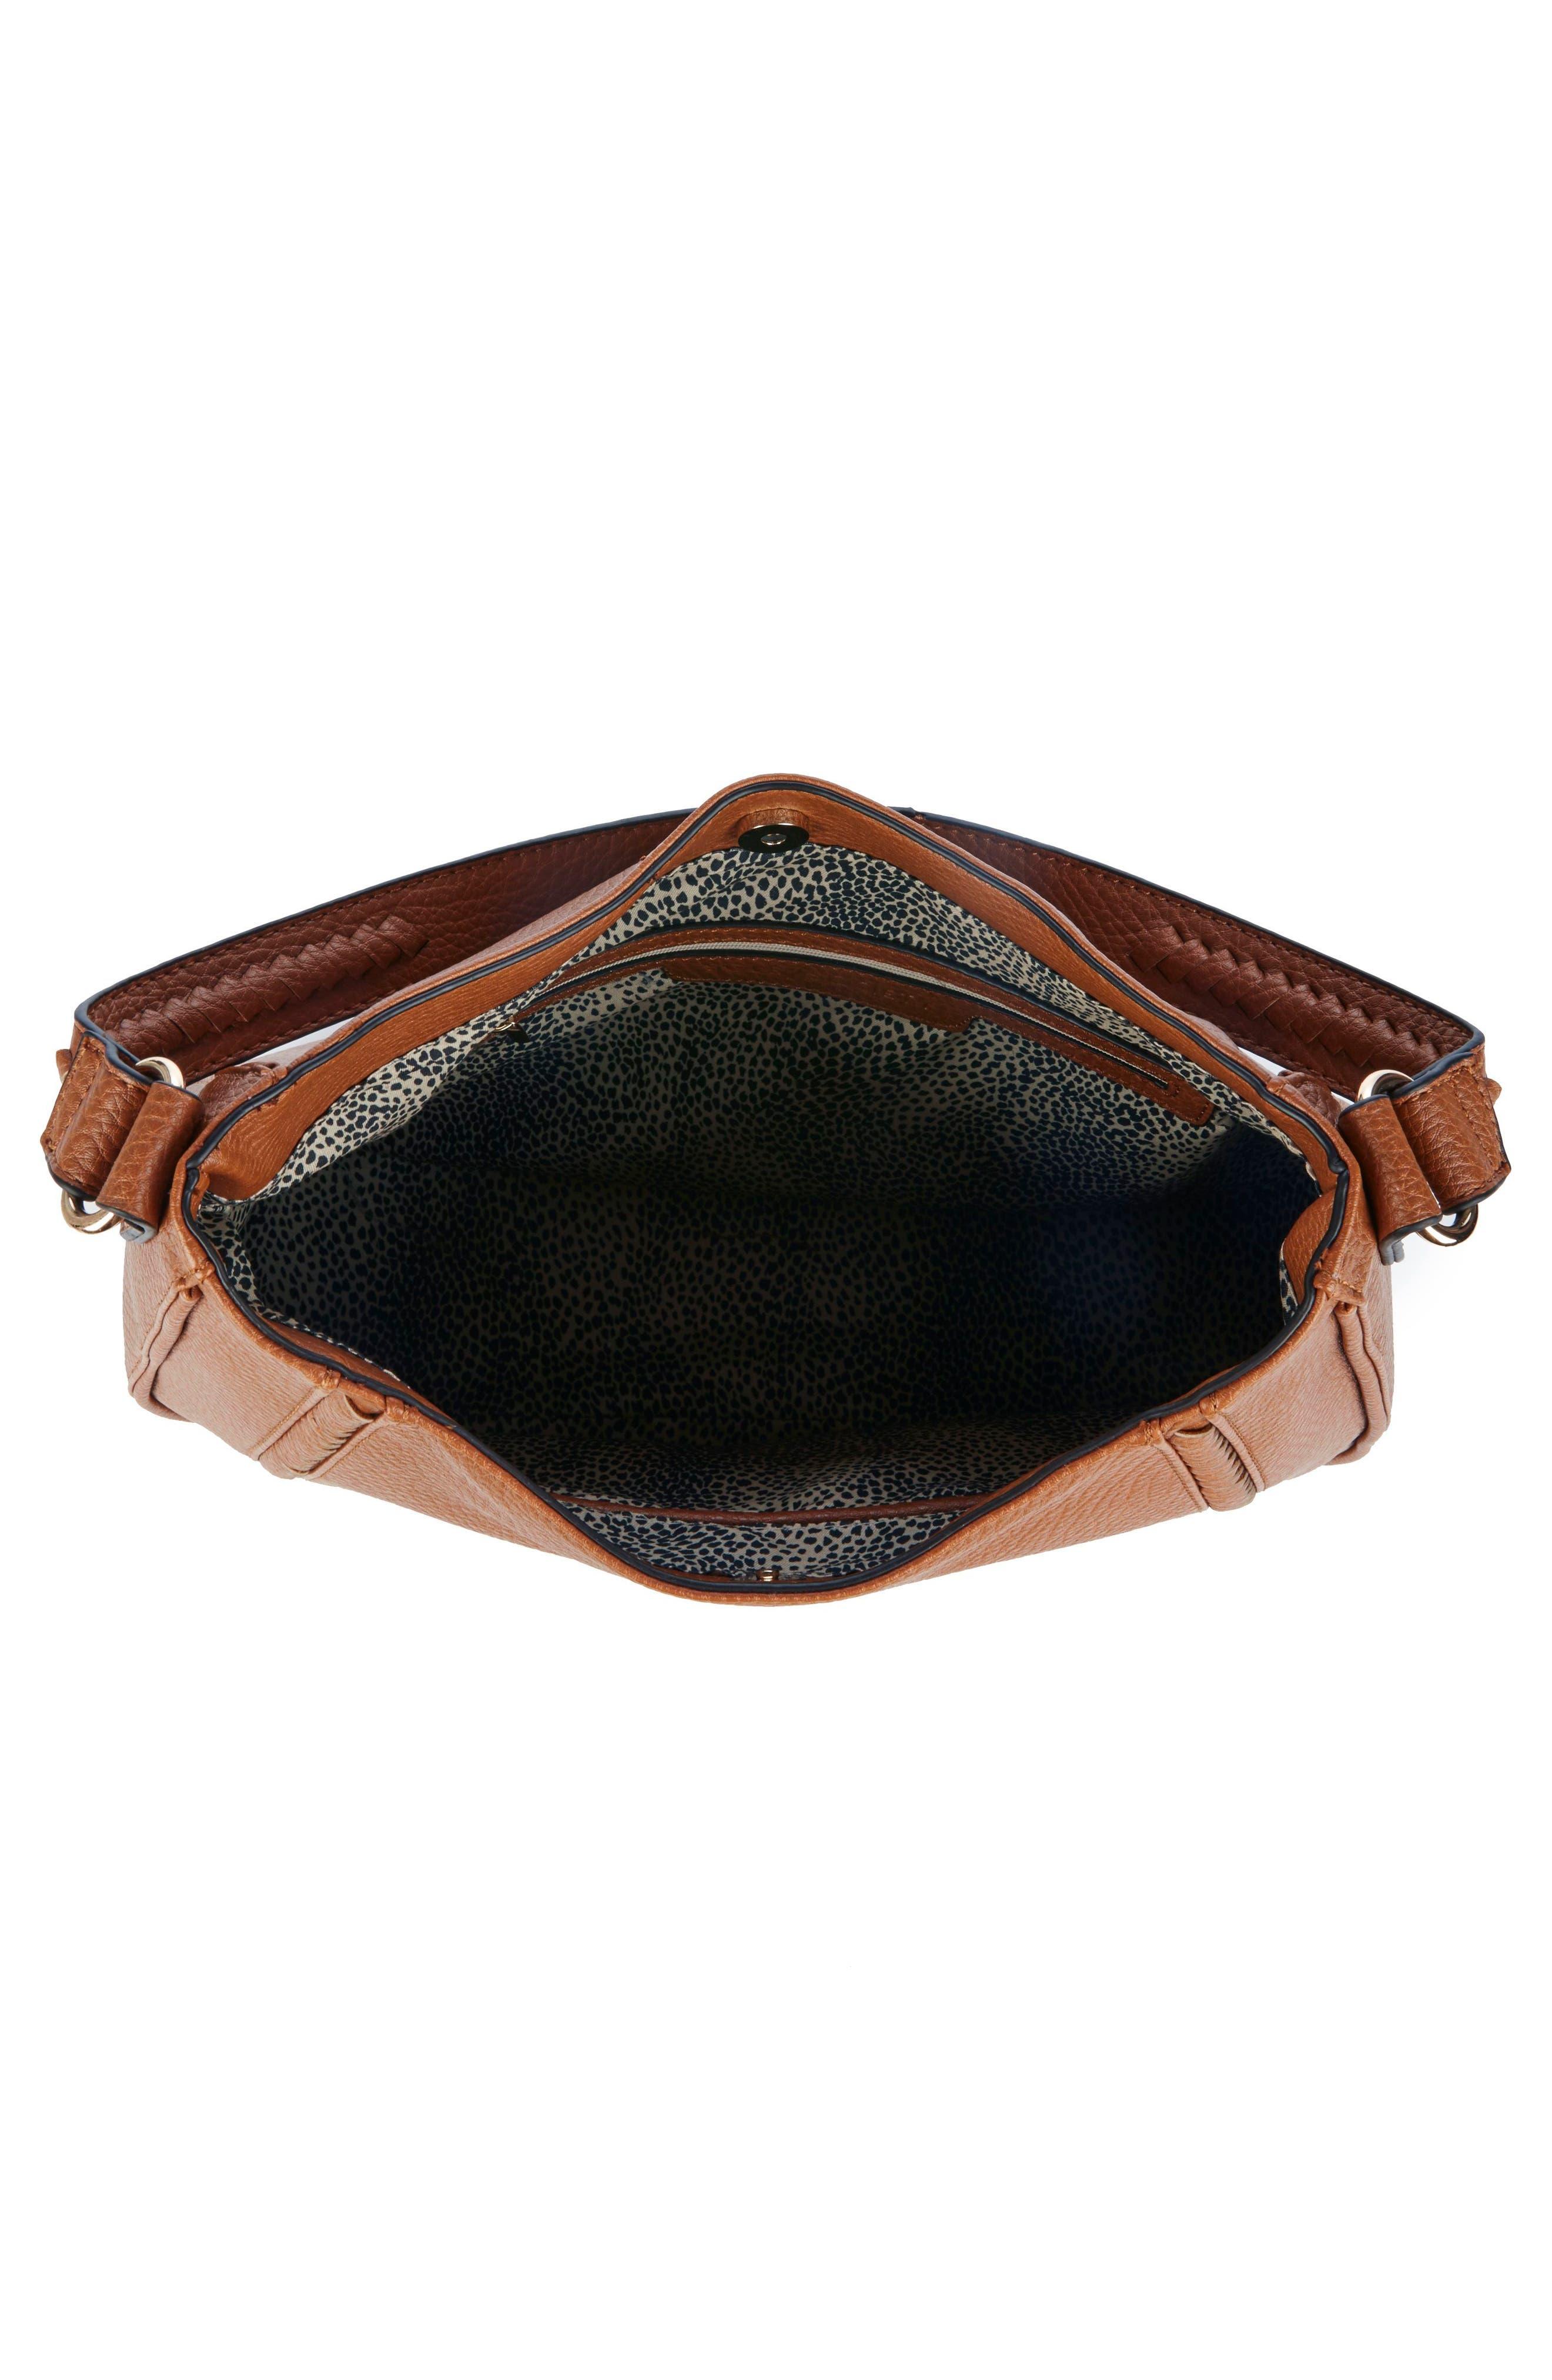 Sarafina Faux Leather Shoulder Bag,                             Alternate thumbnail 3, color,                             Cognac